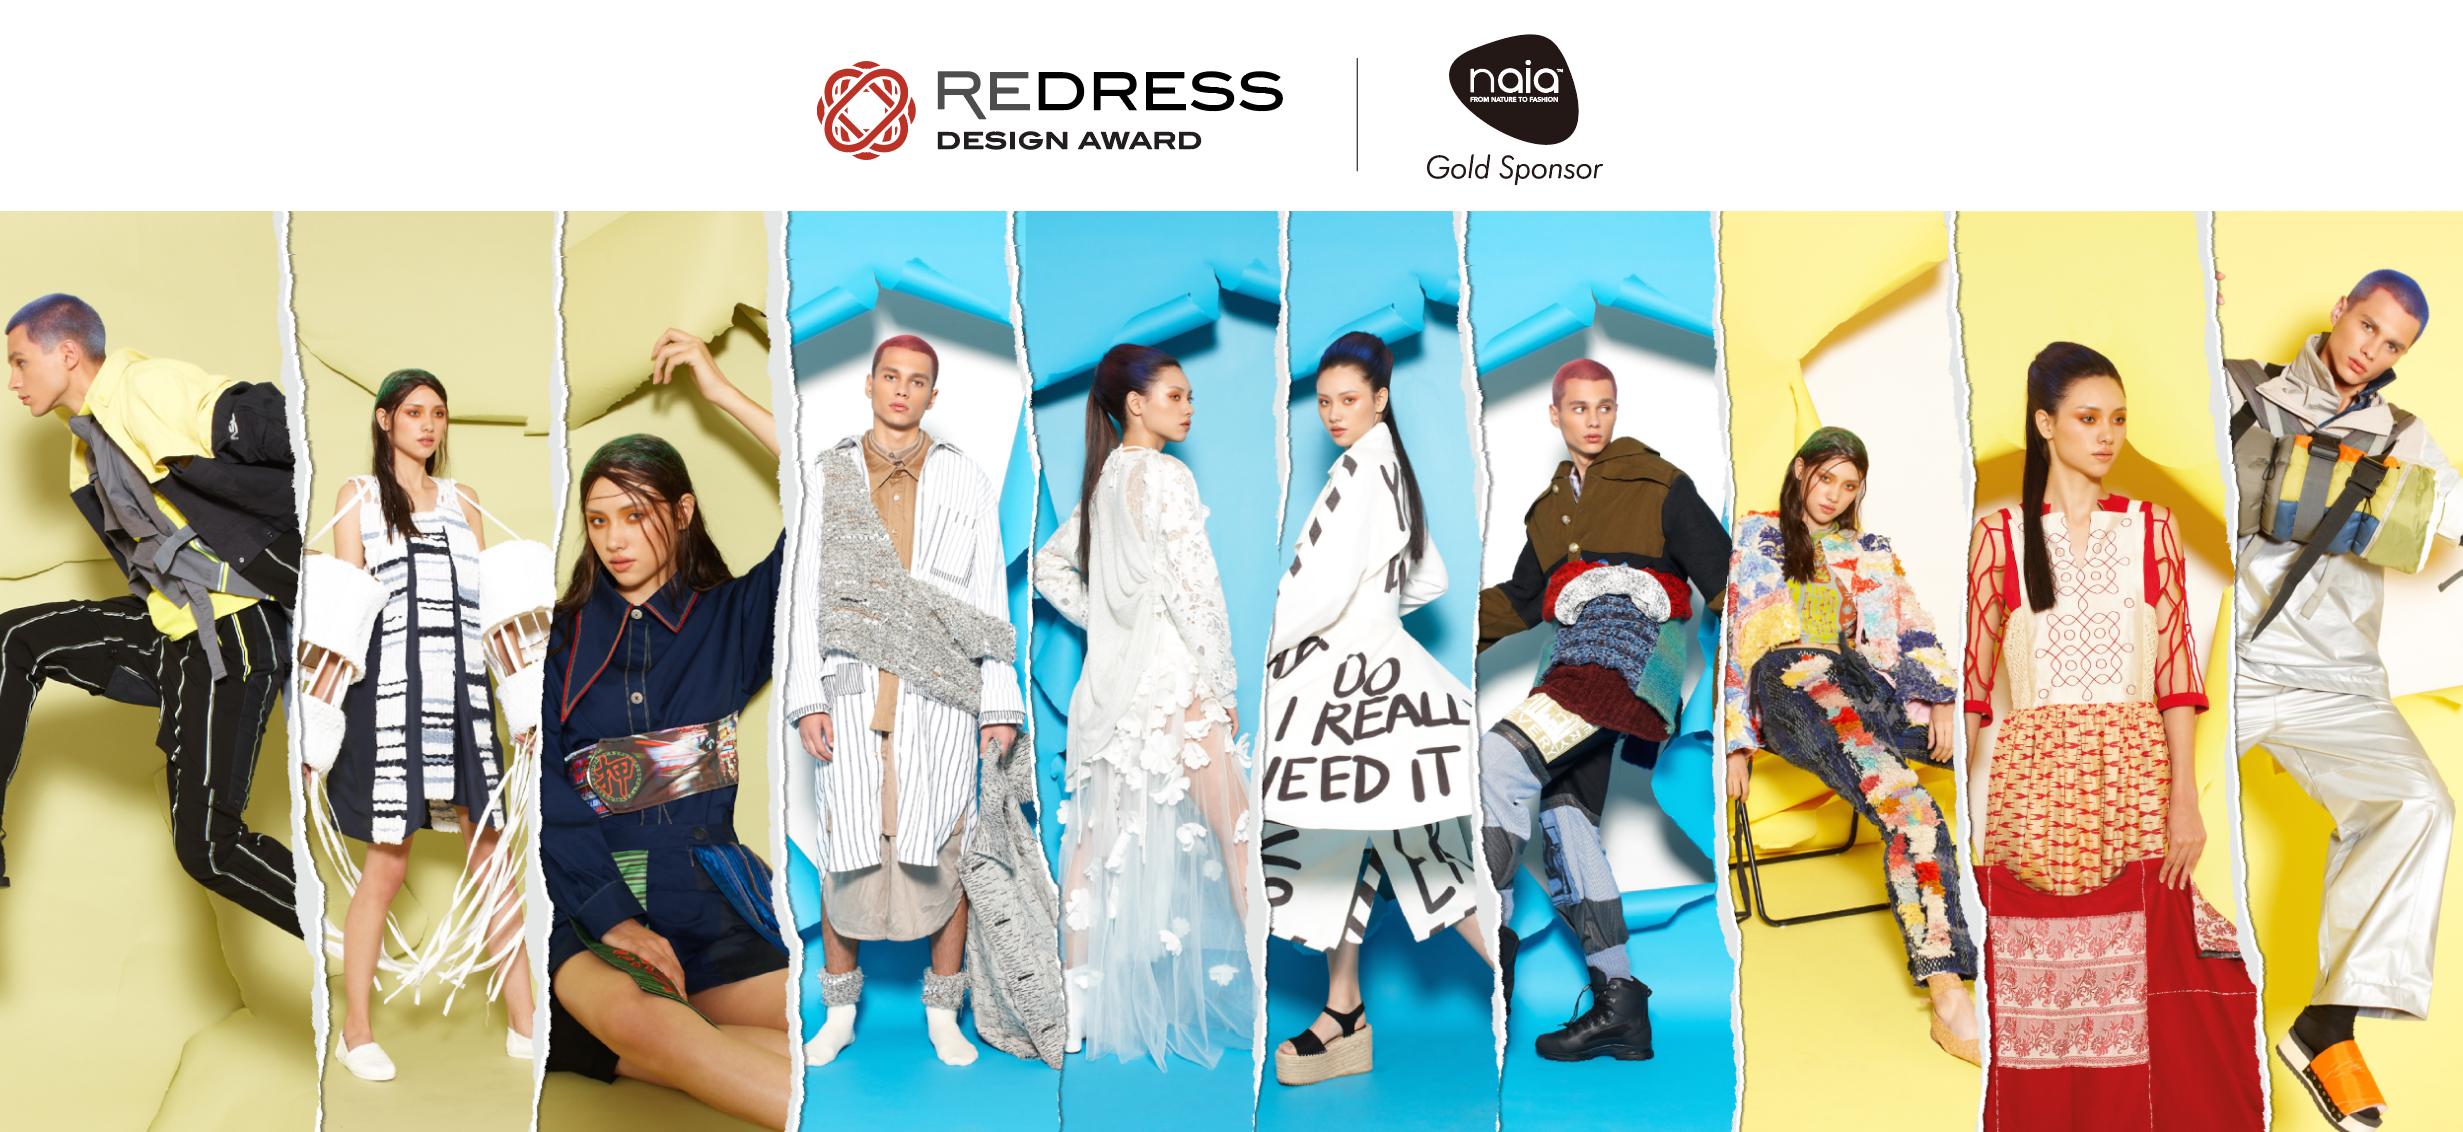 Redress Design Award 2019